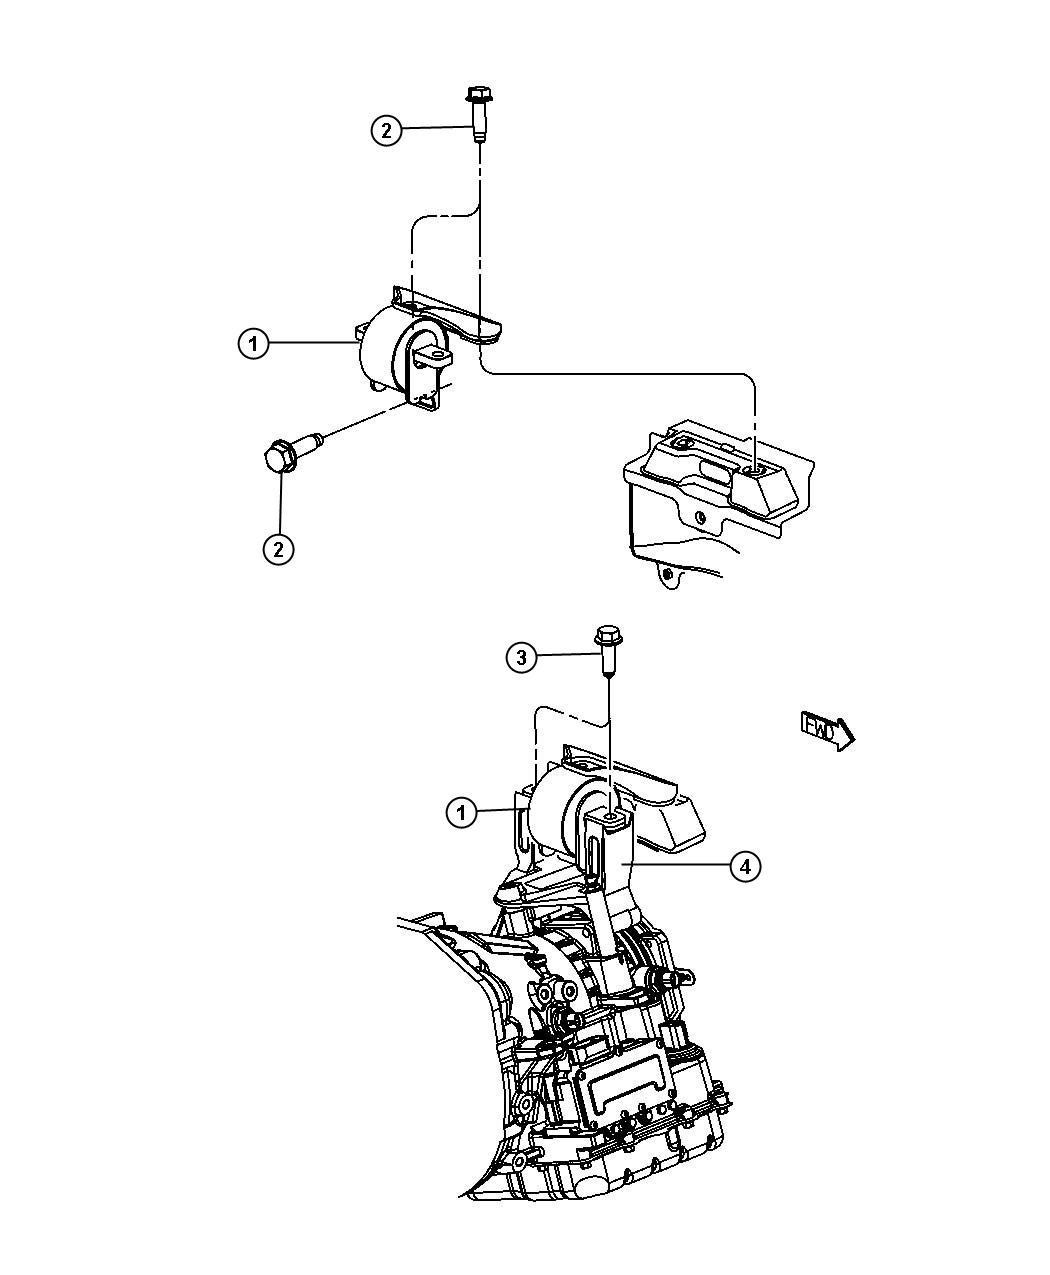 Chrysler Sebring Bushing  Isolator  Transmission Mount